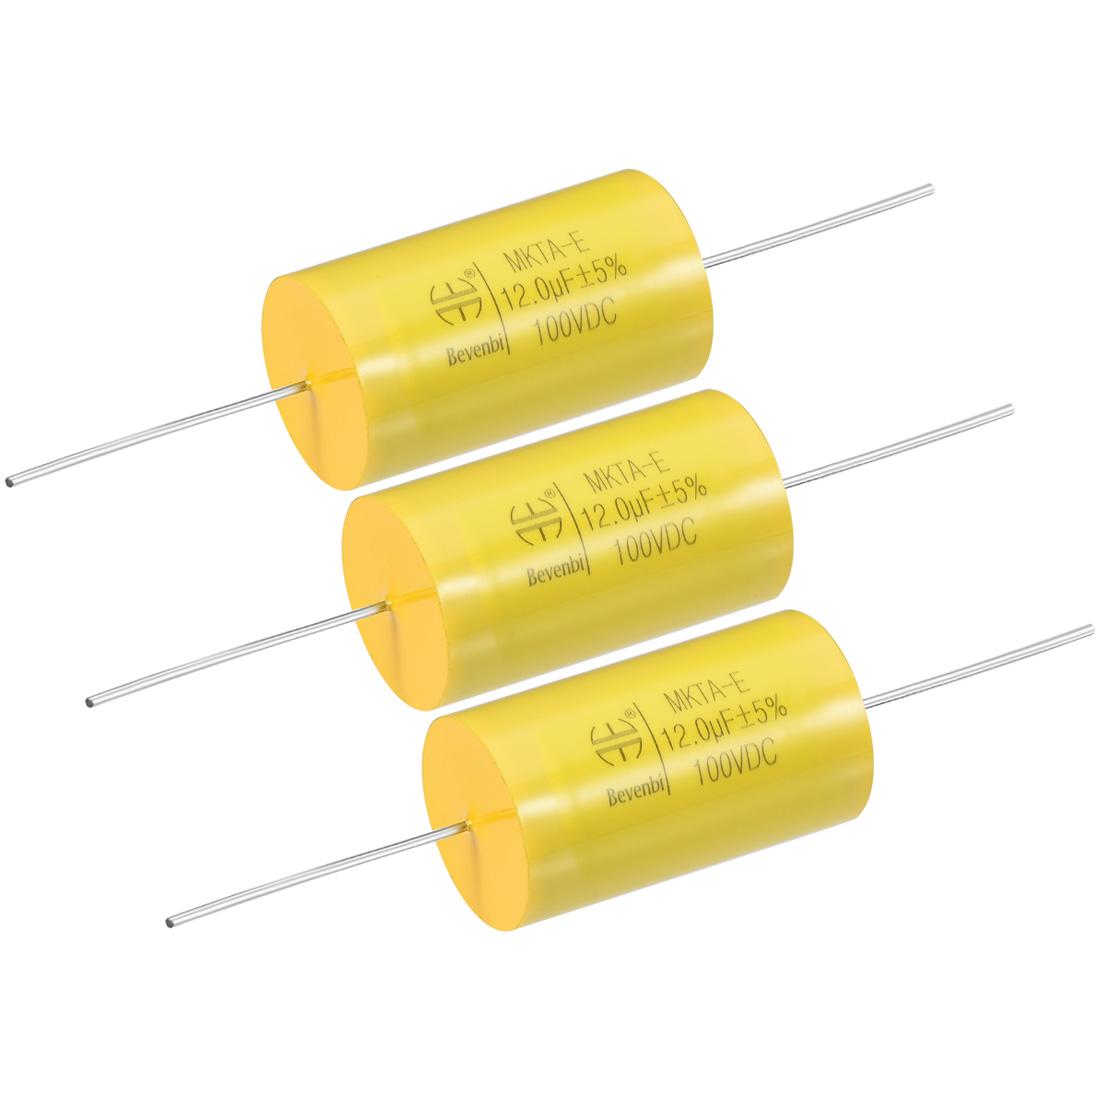 Film Capacitor 100V DC 12.0uF MKTA-E Round Polypropylene Capacitors Yellow 3pcs